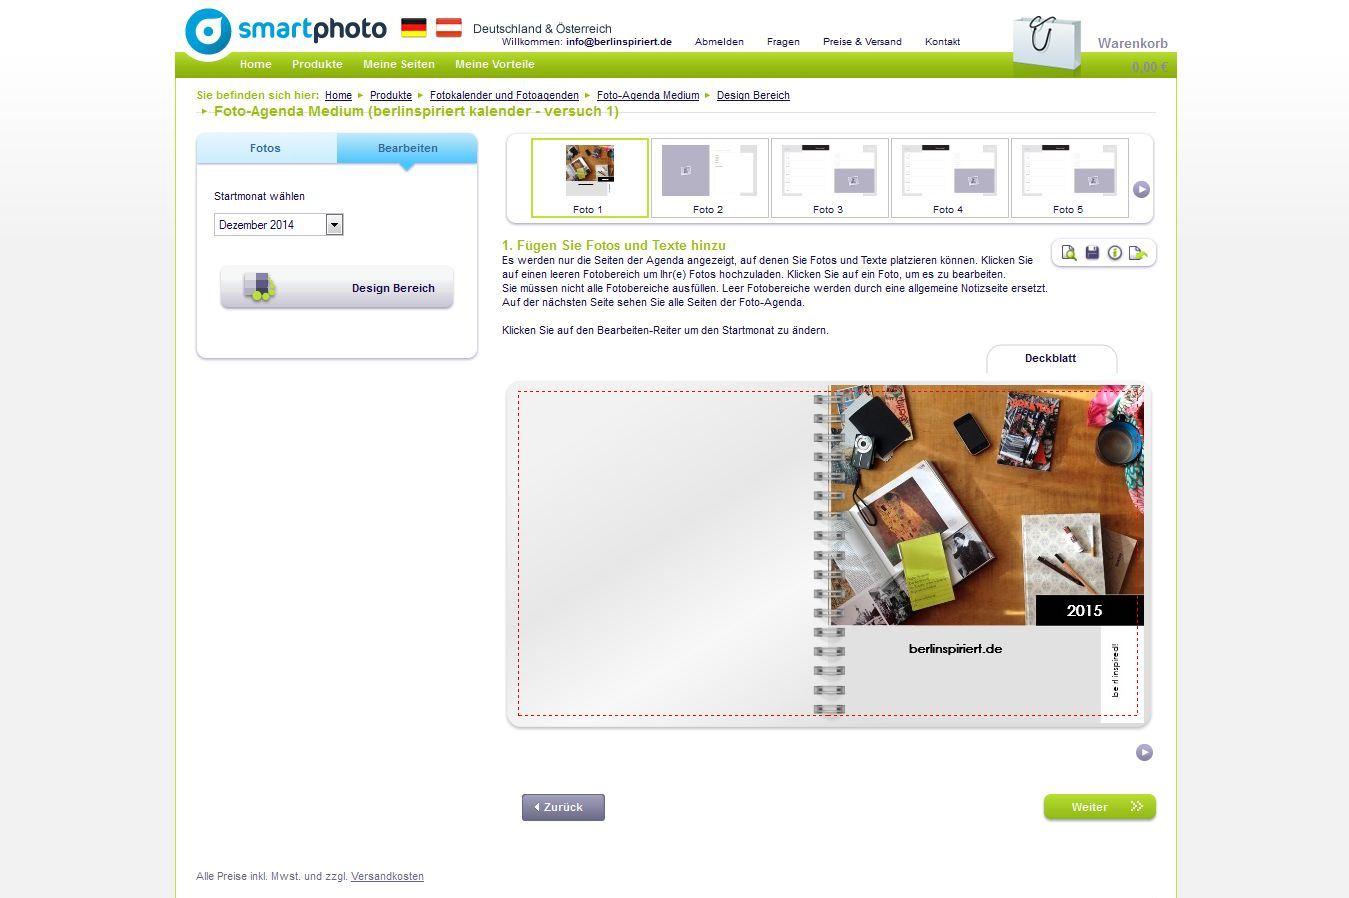 berlinspiriert-fotografie-smartphoto-design (6)